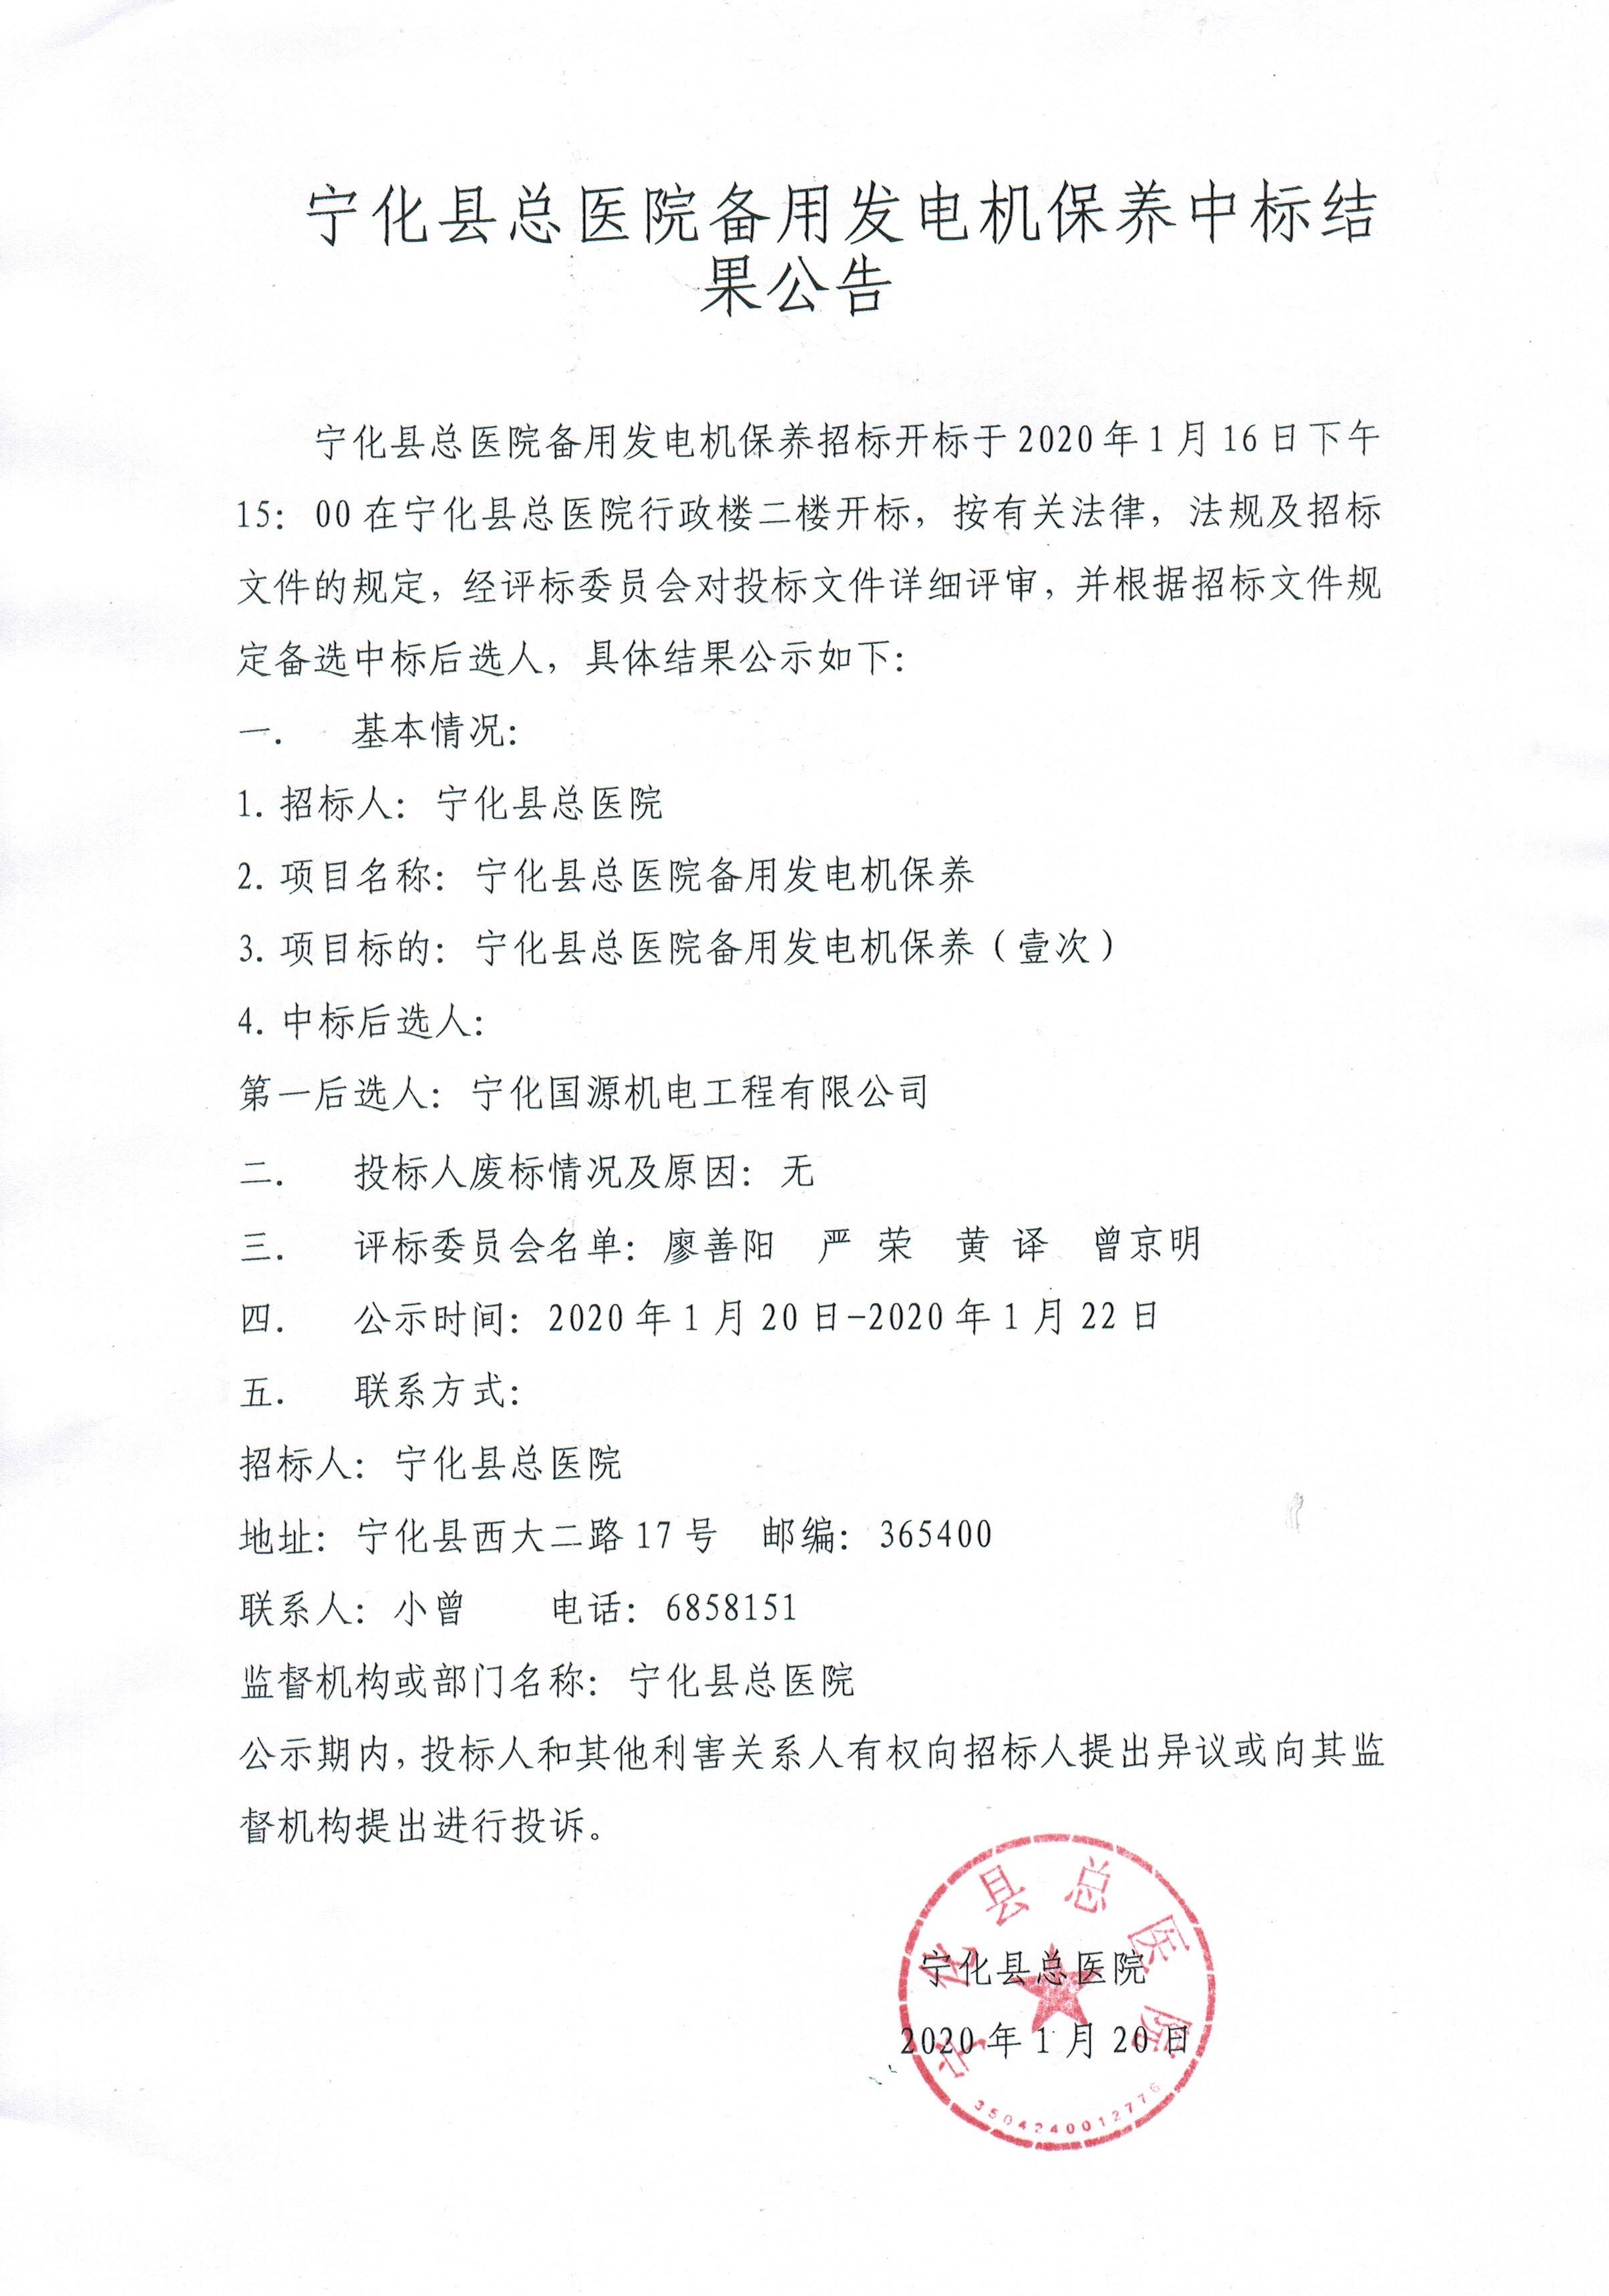 寧(ning)化(hua)縣總醫院備(bei)用(yong)發(fa)電機保養中(zhong)標結果(guo)公告(gao)